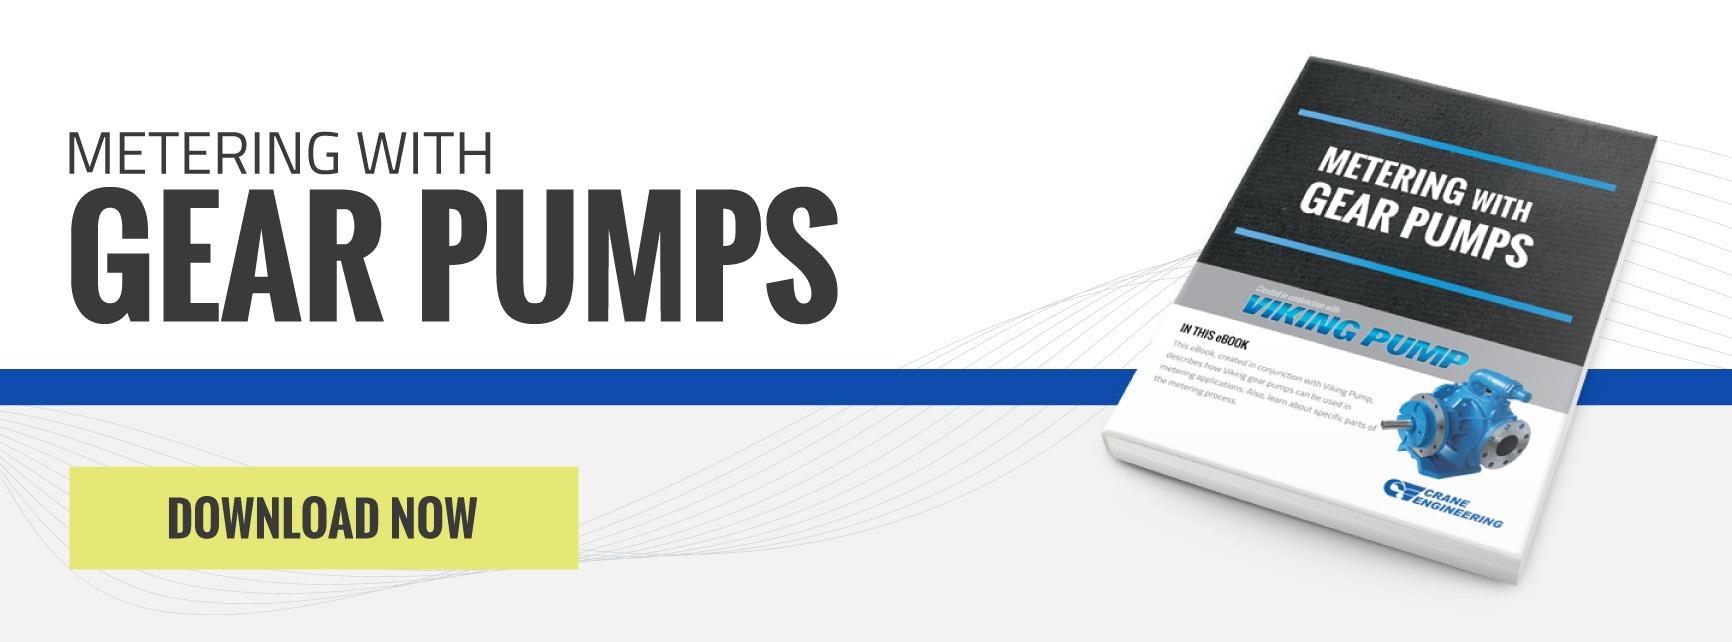 Download the Metering with Gear Pumps Ebook